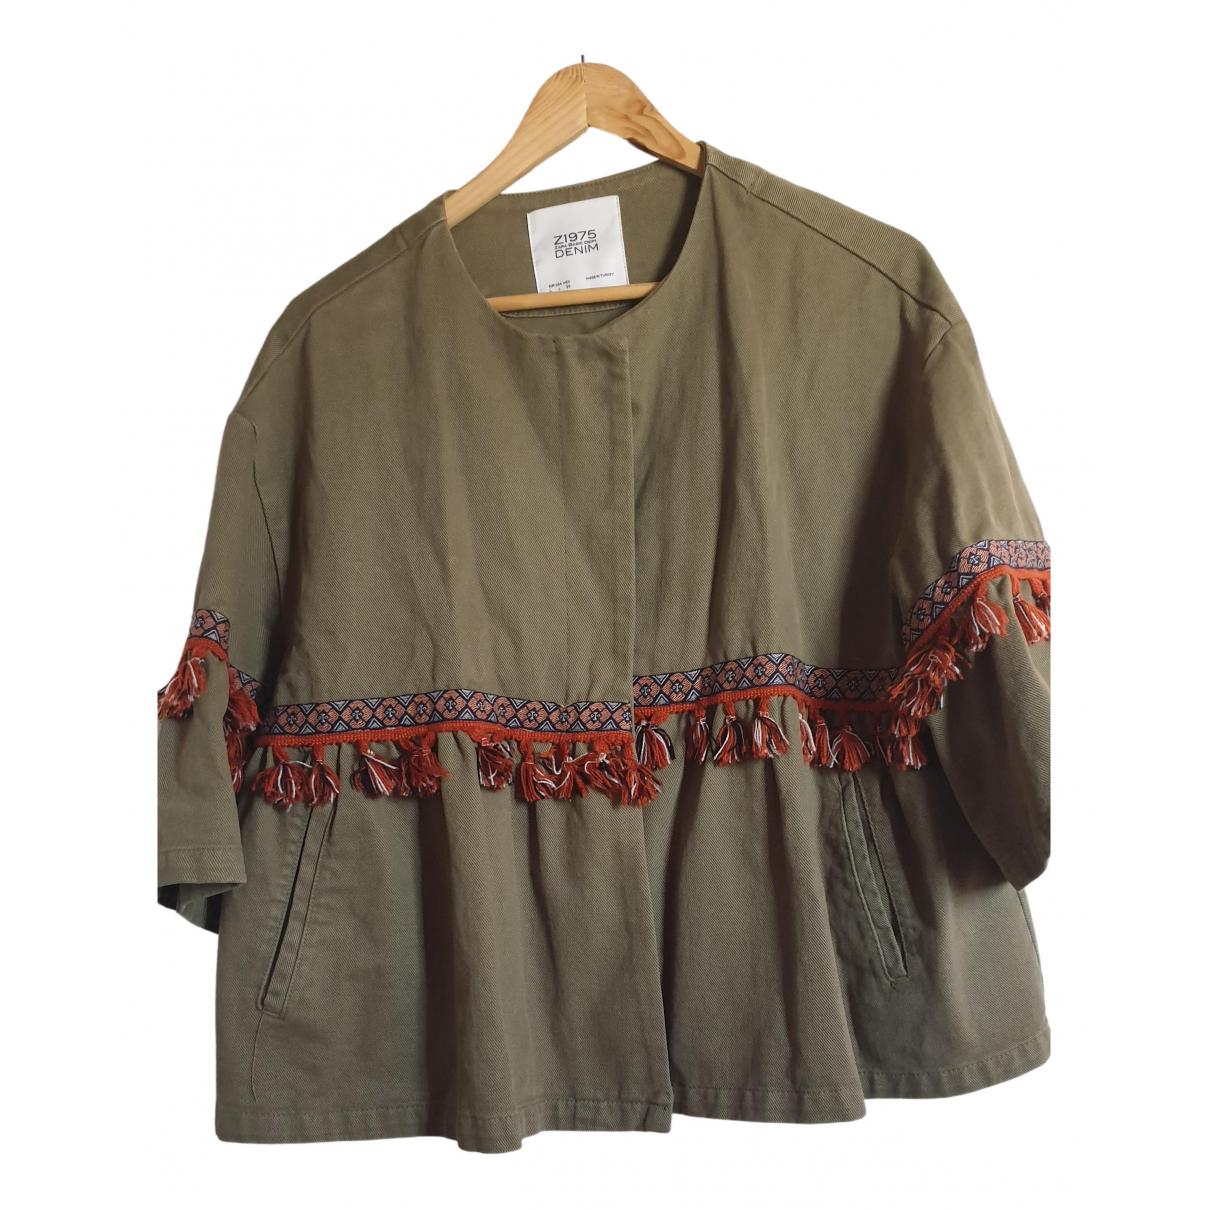 Zara \N Khaki Denim - Jeans jacket for Women L International